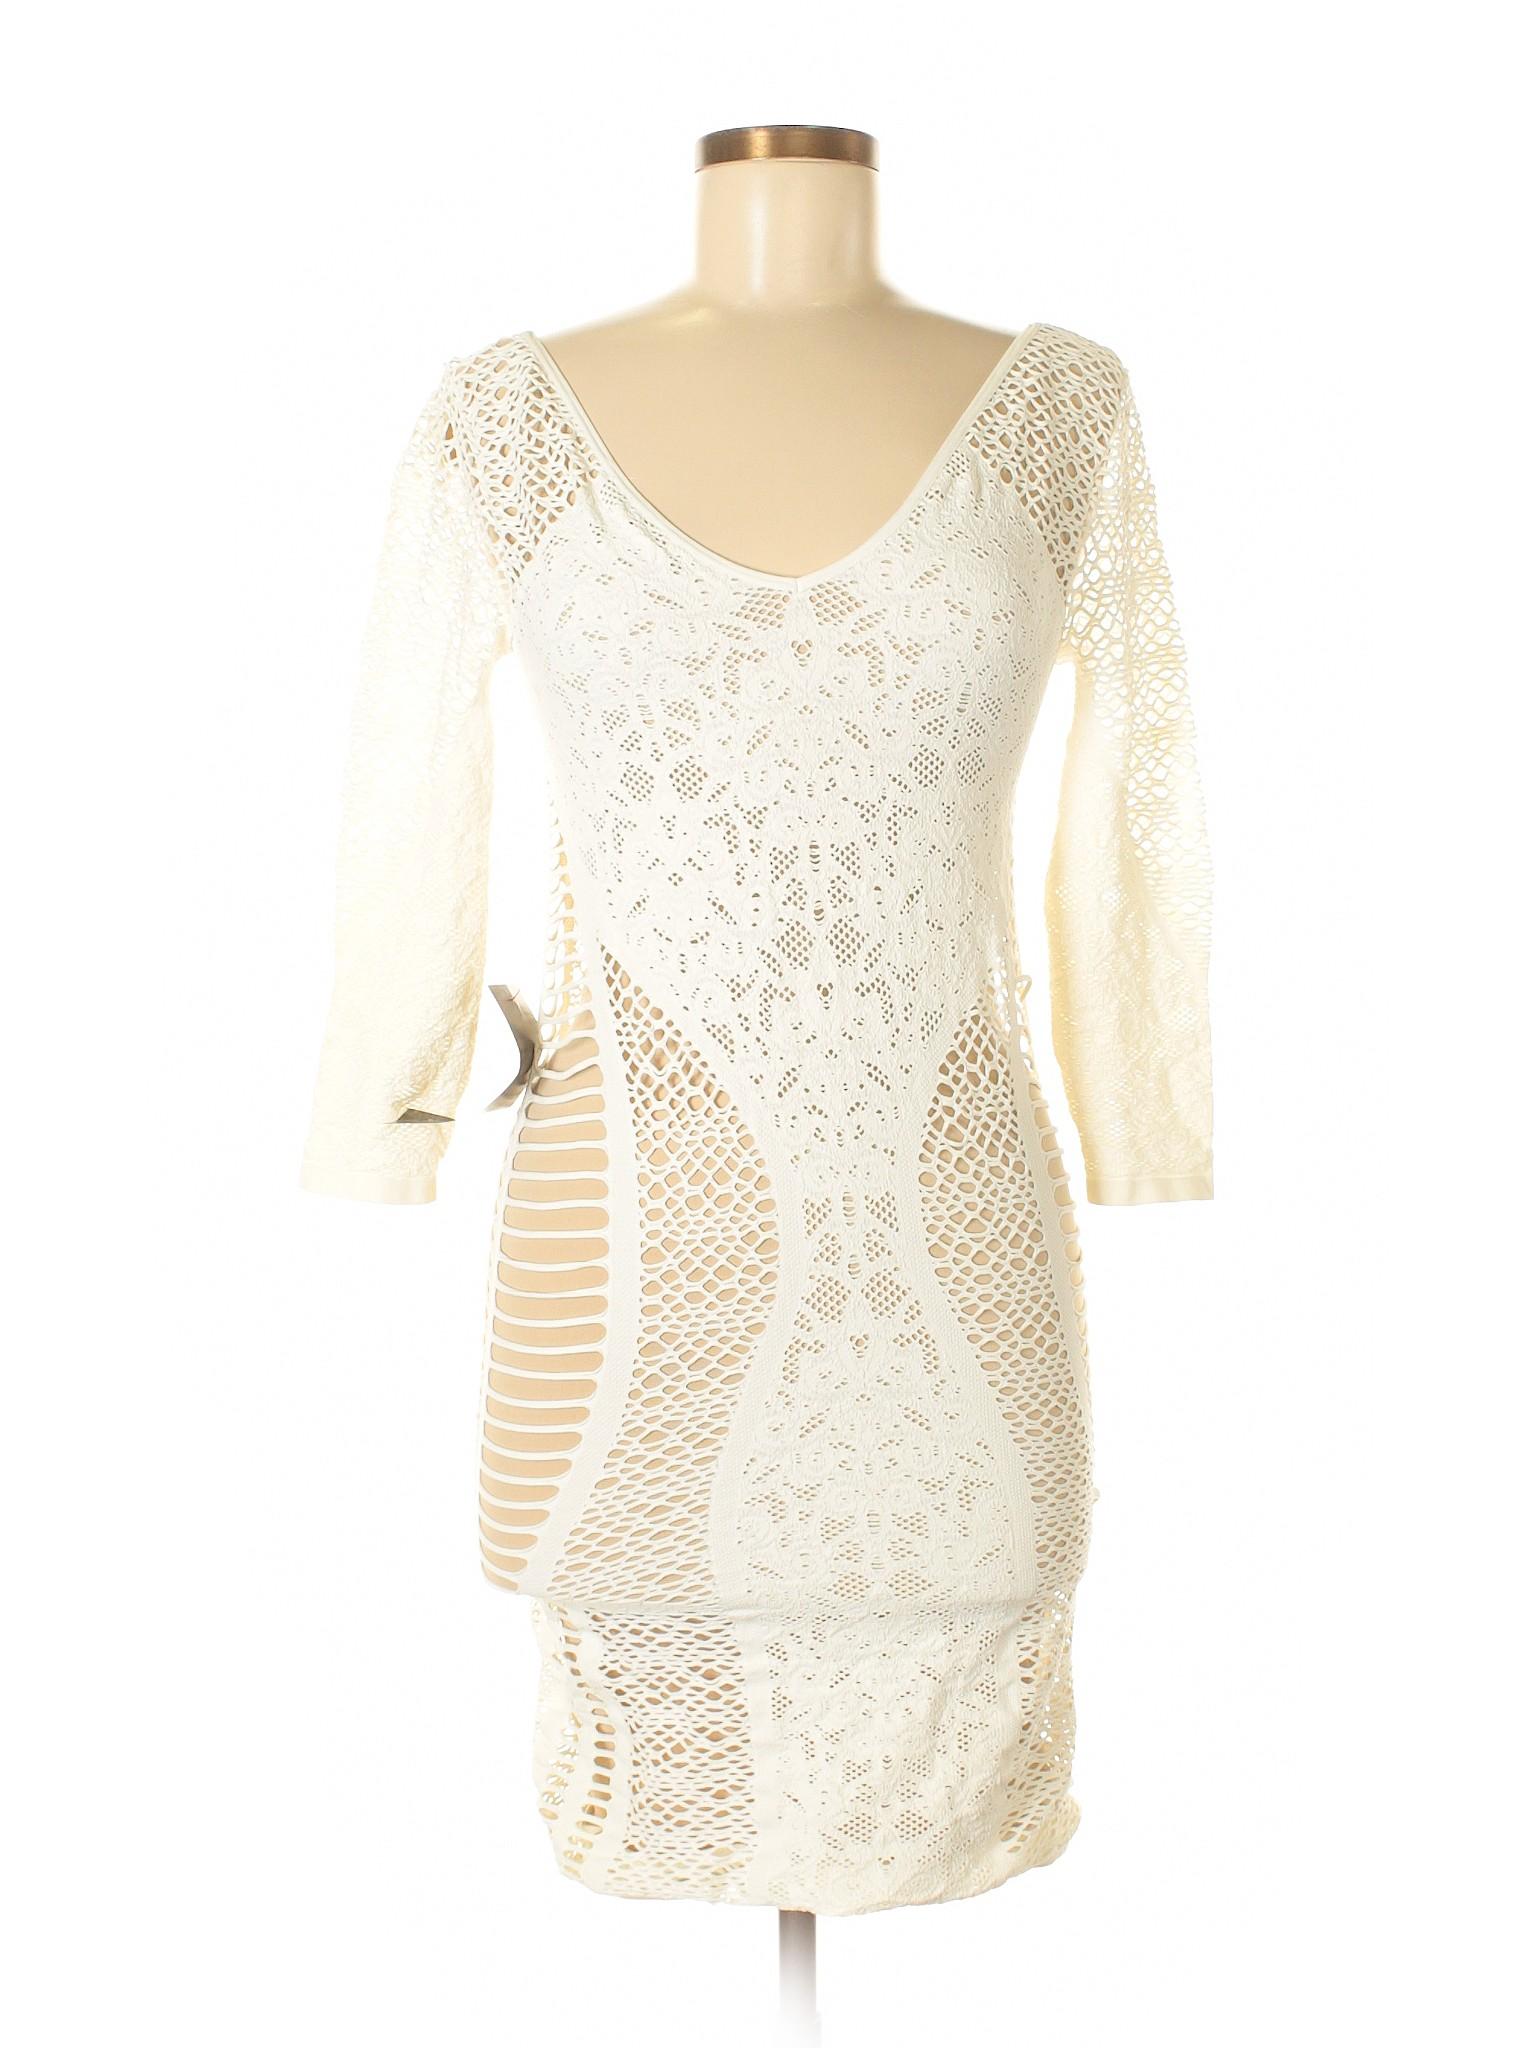 Bebe Bebe Winter Boutique Casual Boutique Casual Boutique Casual Dress Boutique Dress Dress Bebe Winter Winter x0pqWZqwI7